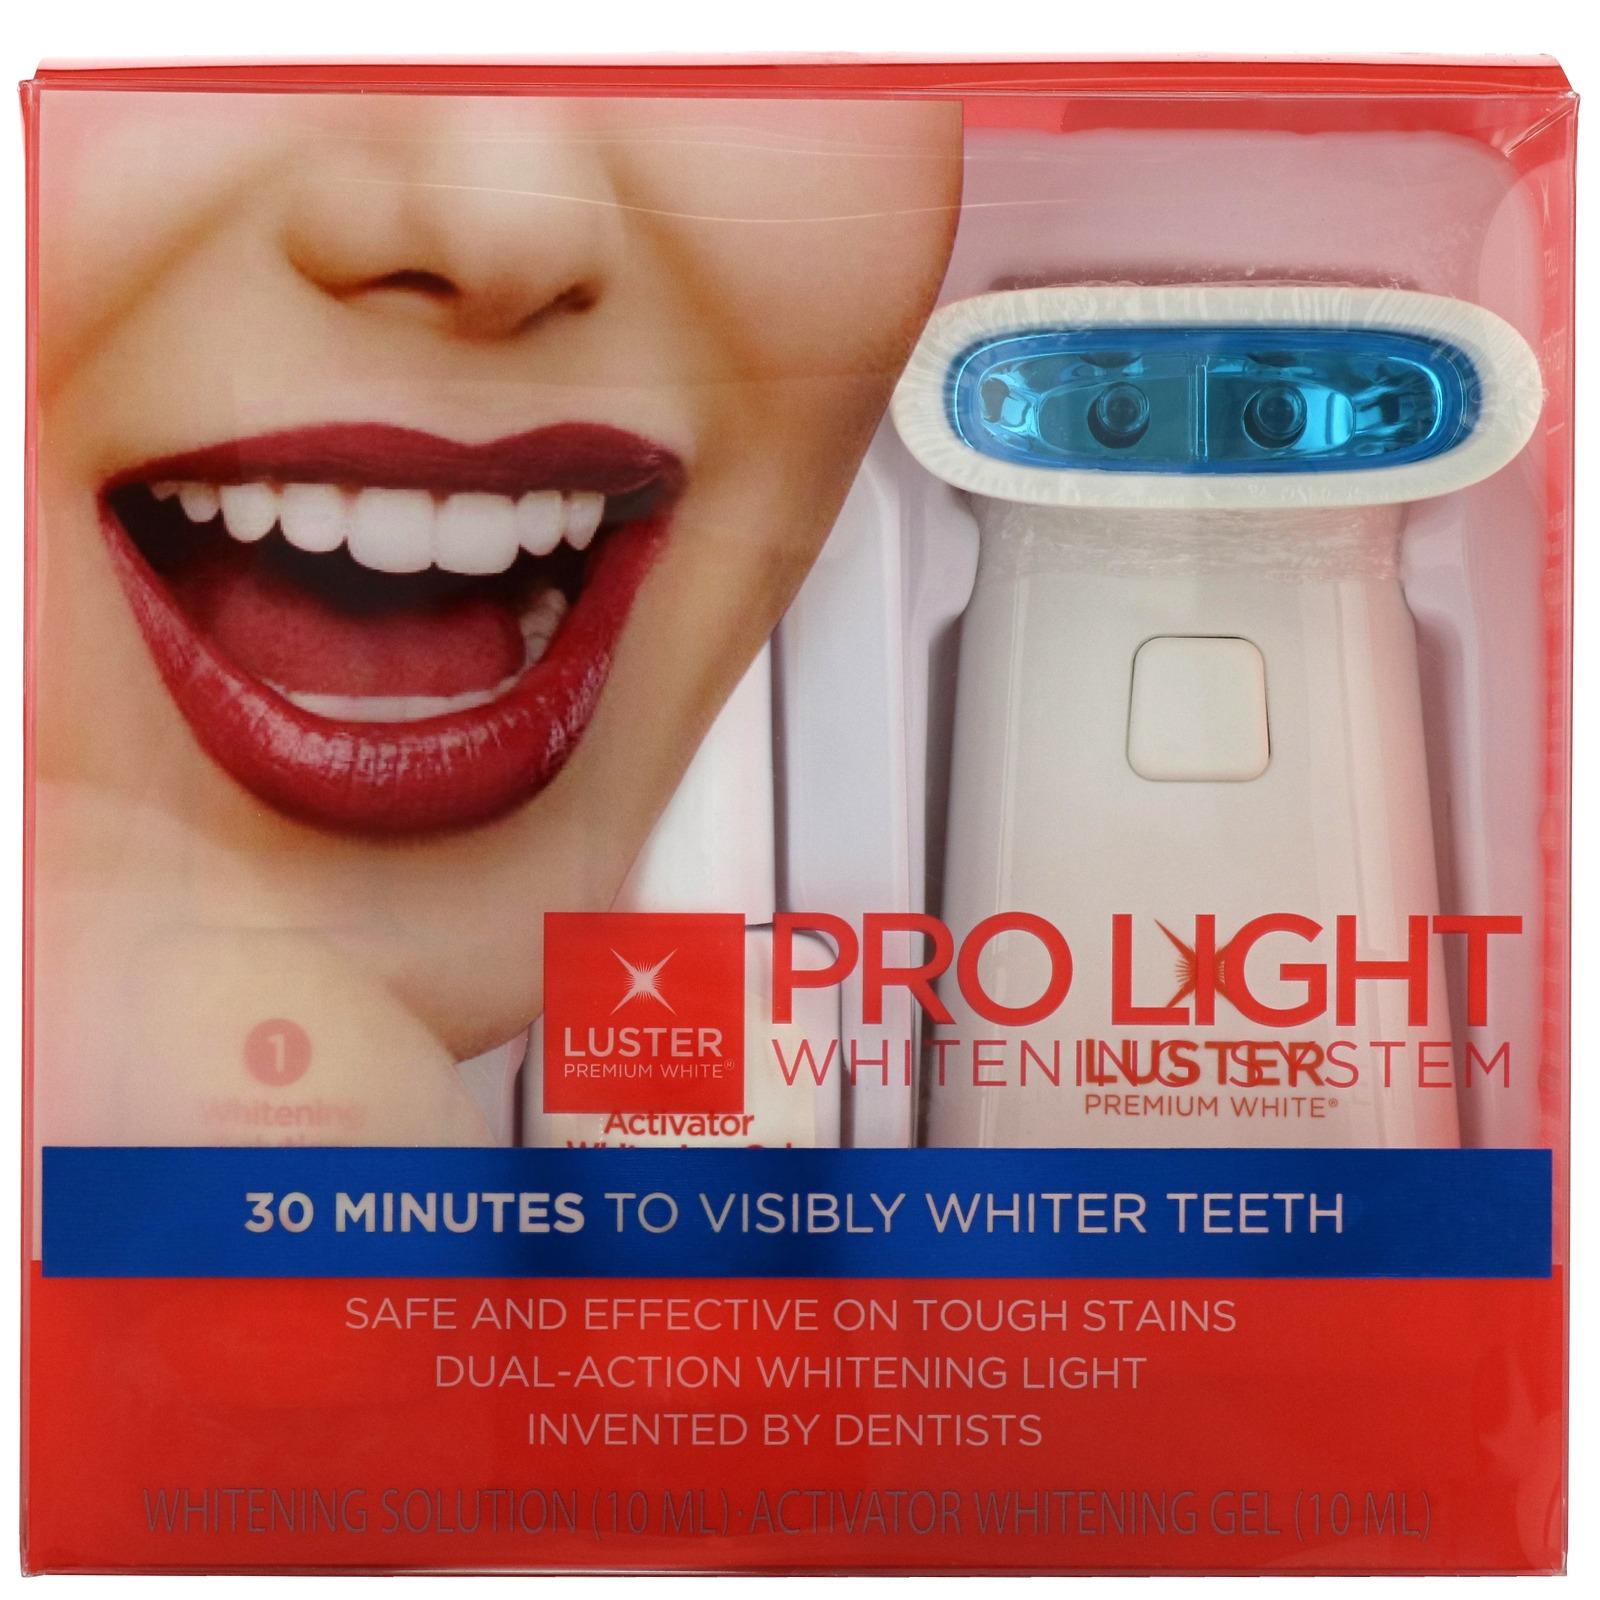 Teeth Whitening Deals Cheap Price Best Sales In Uk Hotukdeals